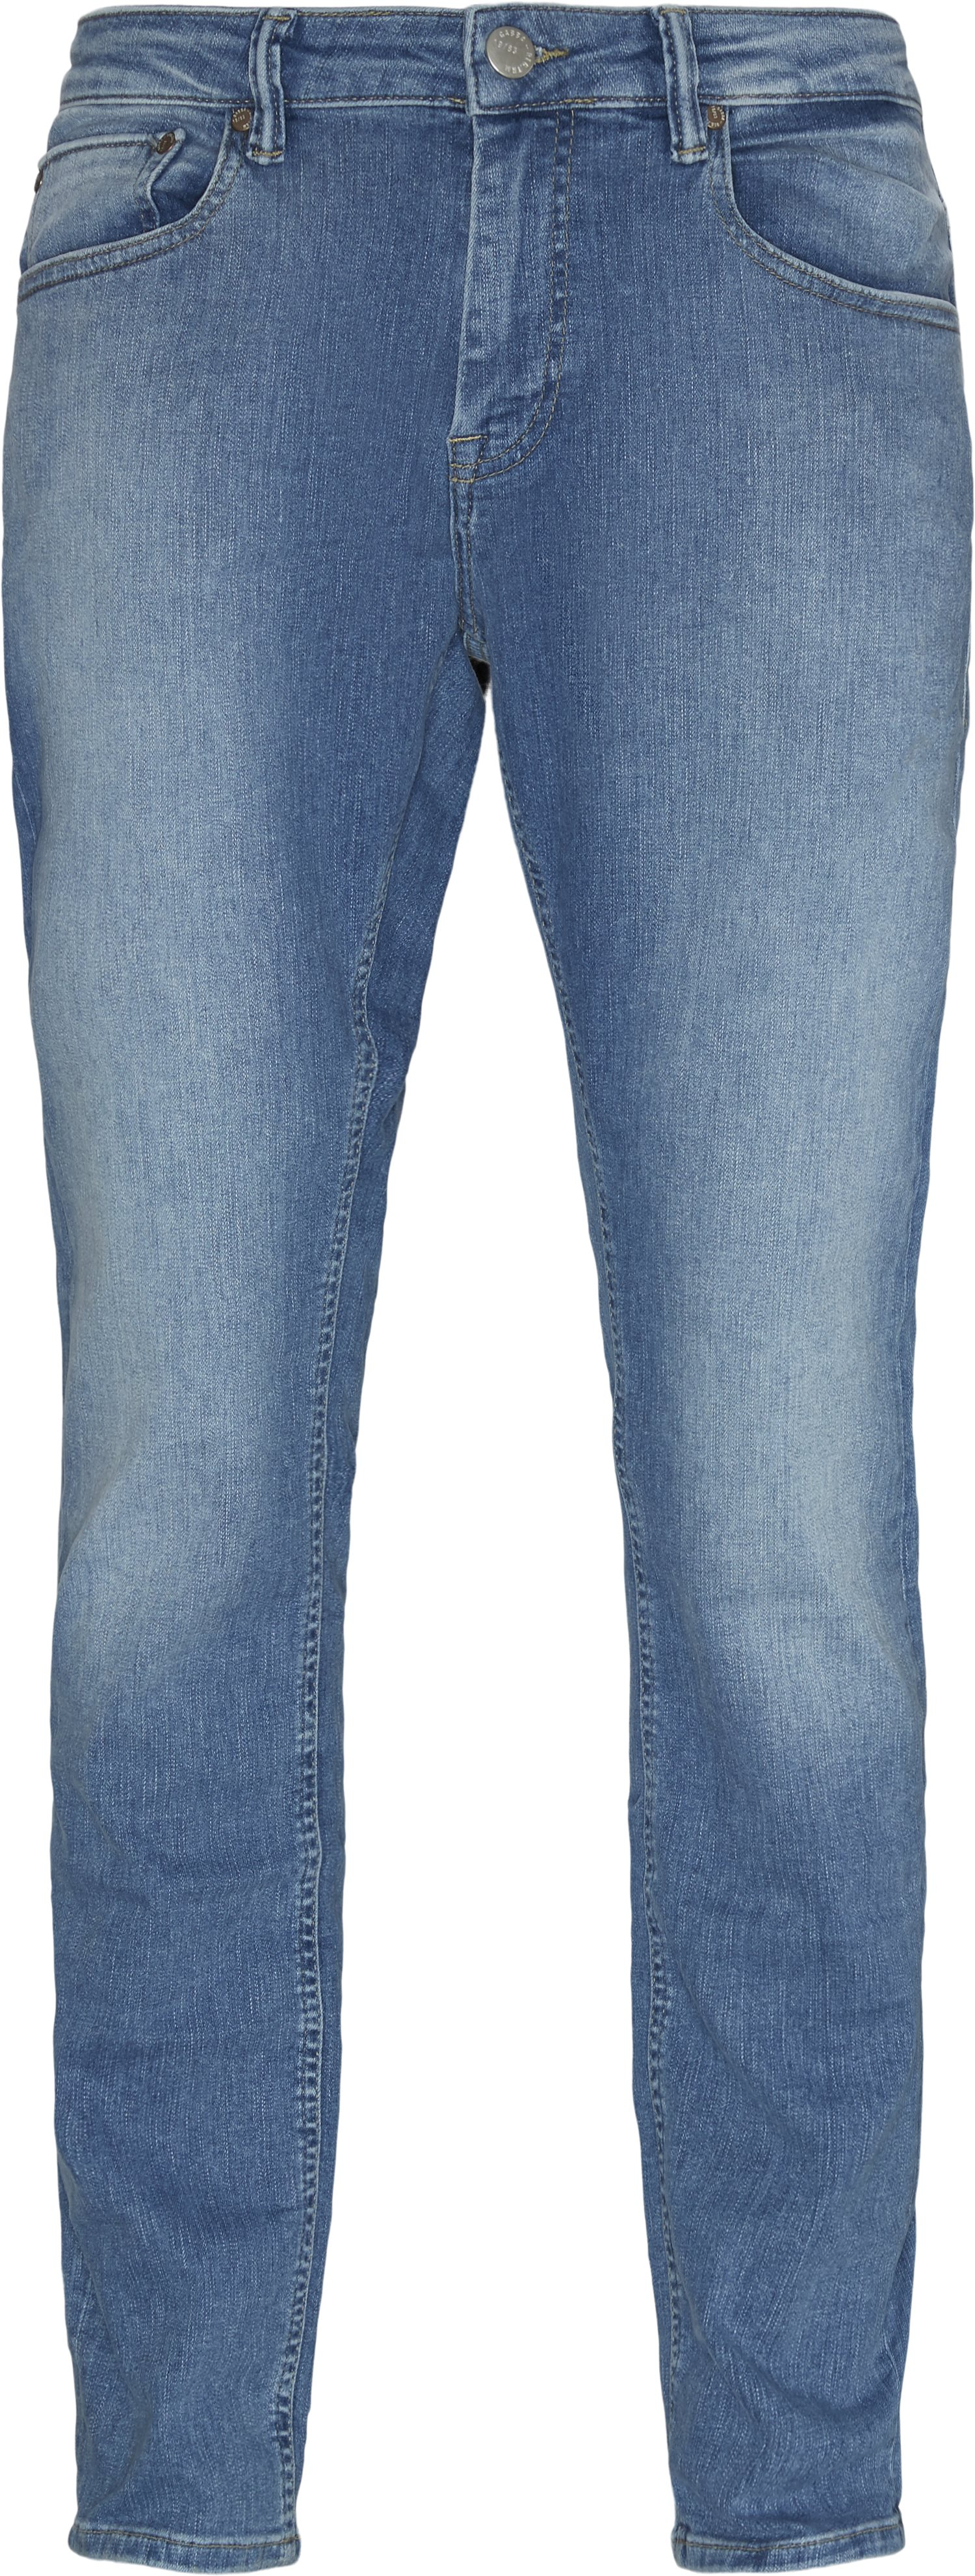 Jones K2615 Jeans - Jeans - Tapered fit - Denim